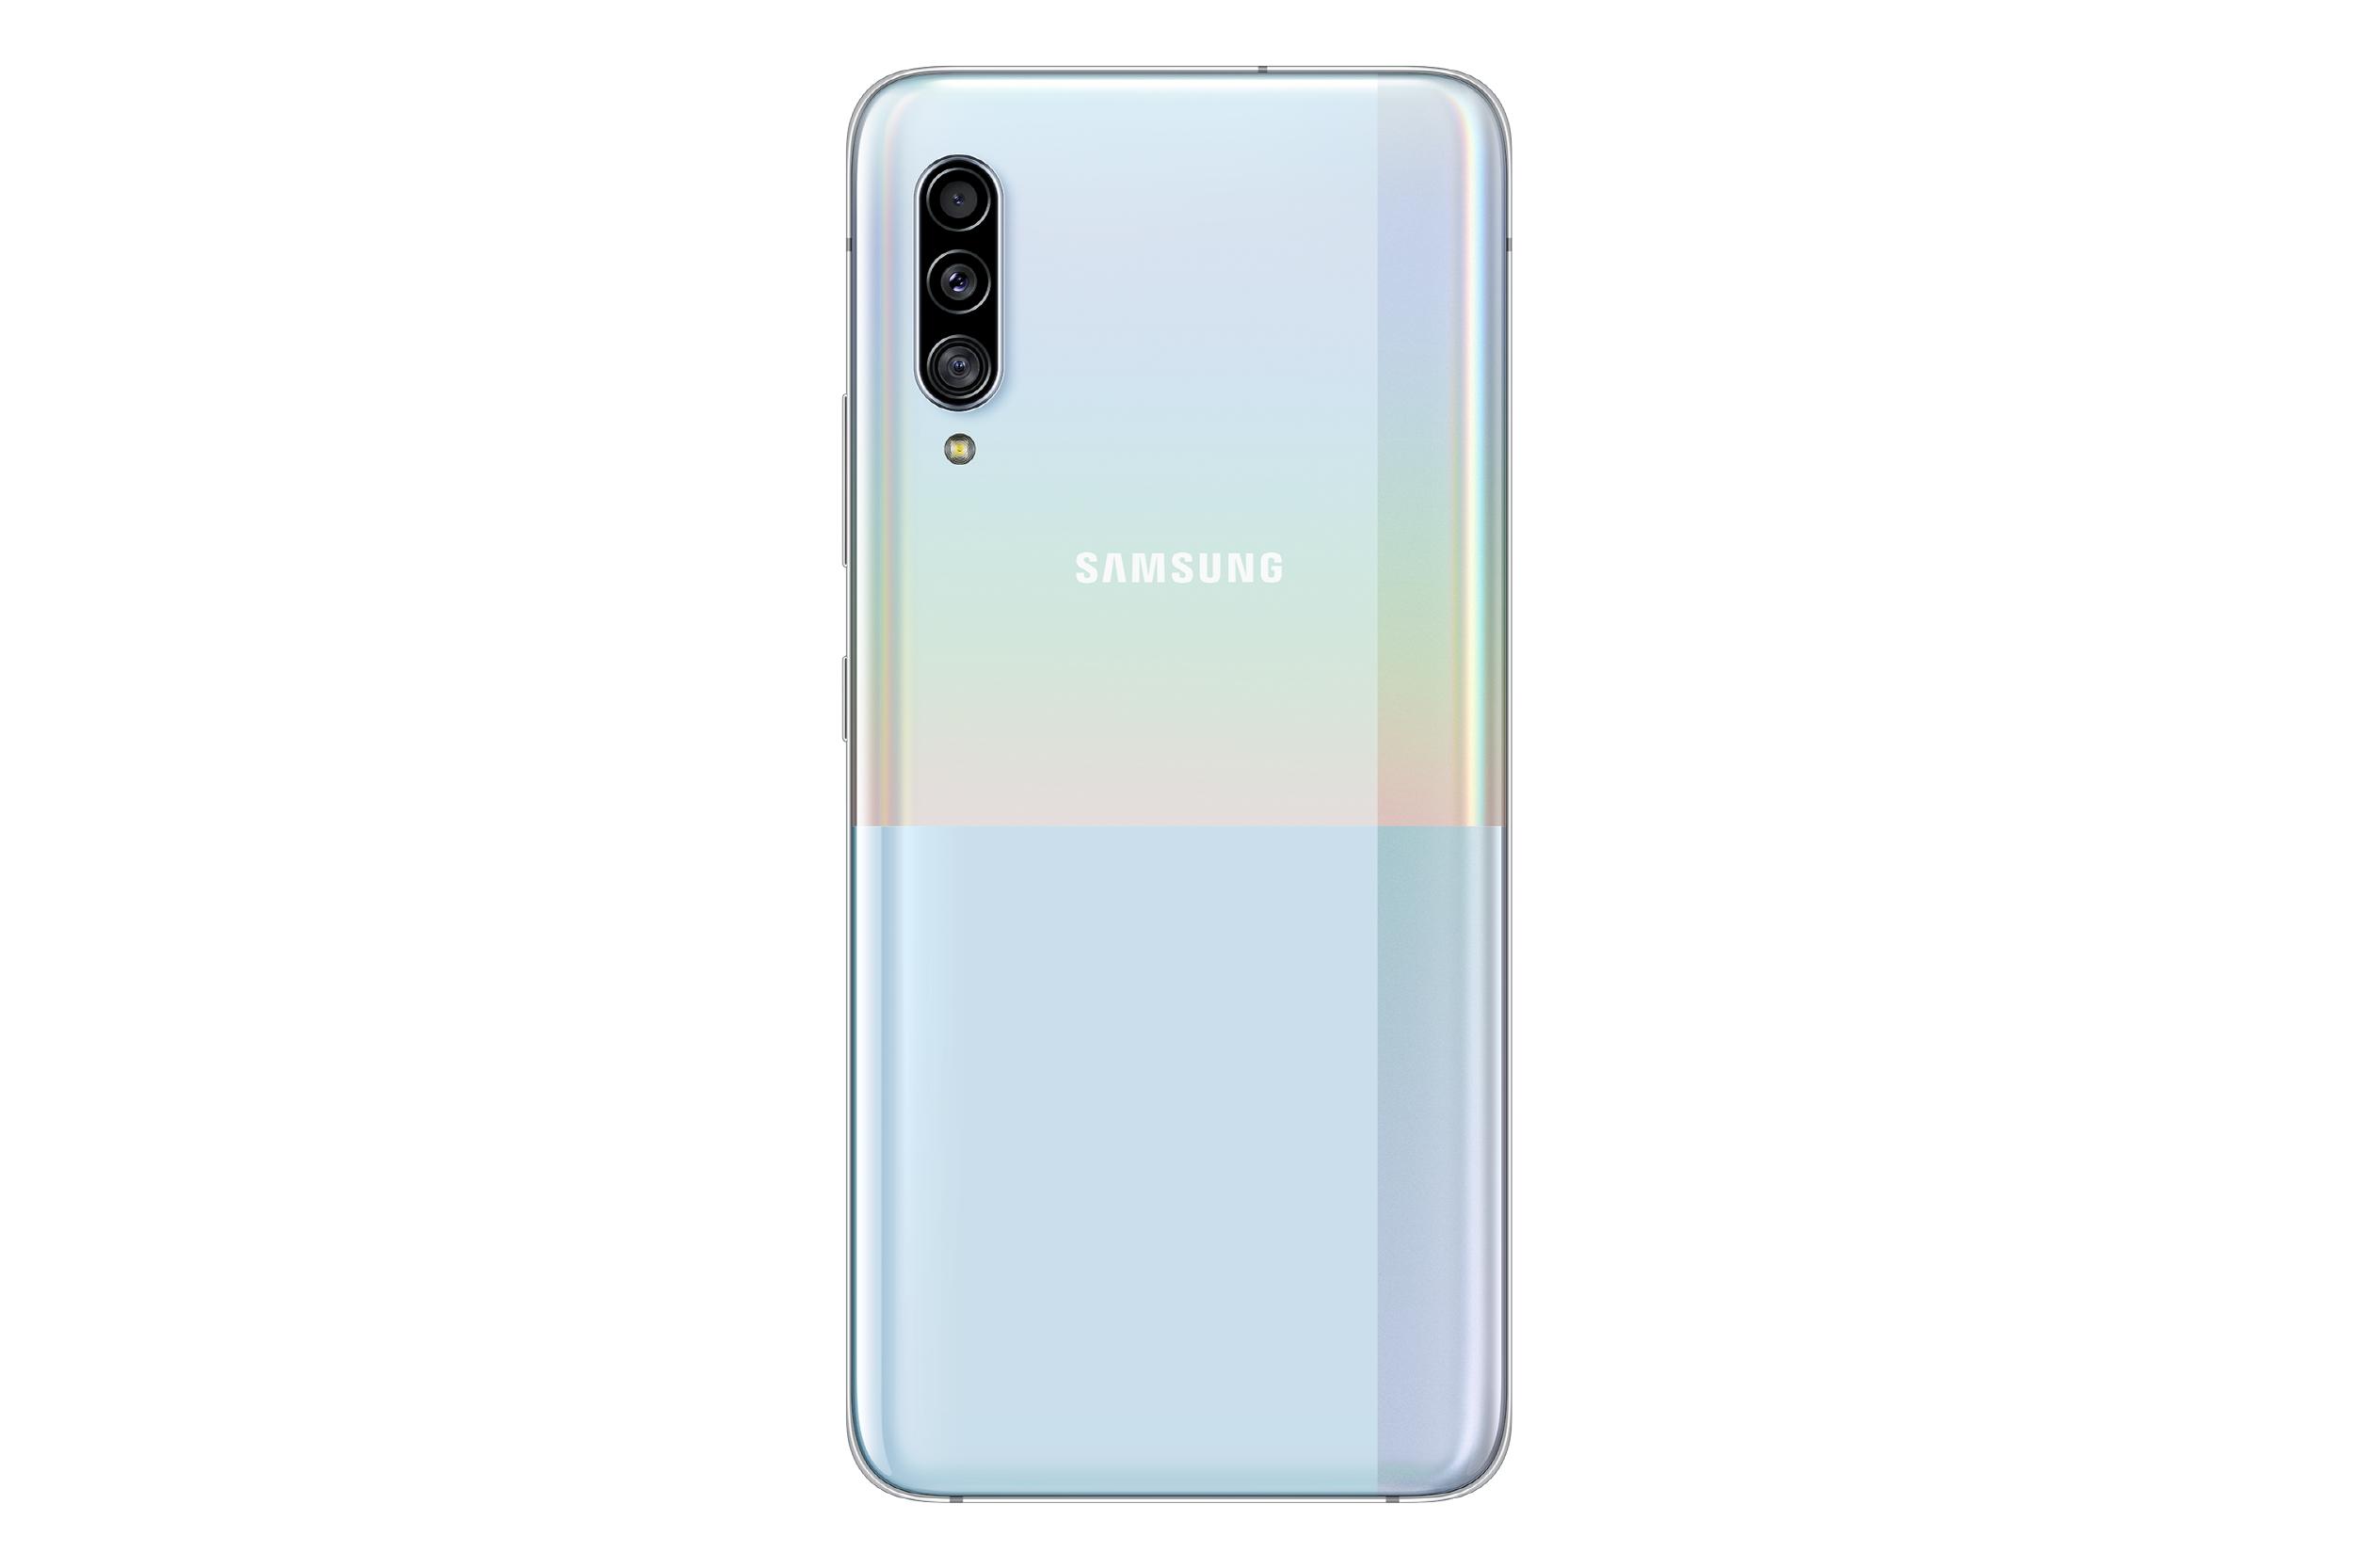 Valkoinen Samsung Galaxy A90 5G